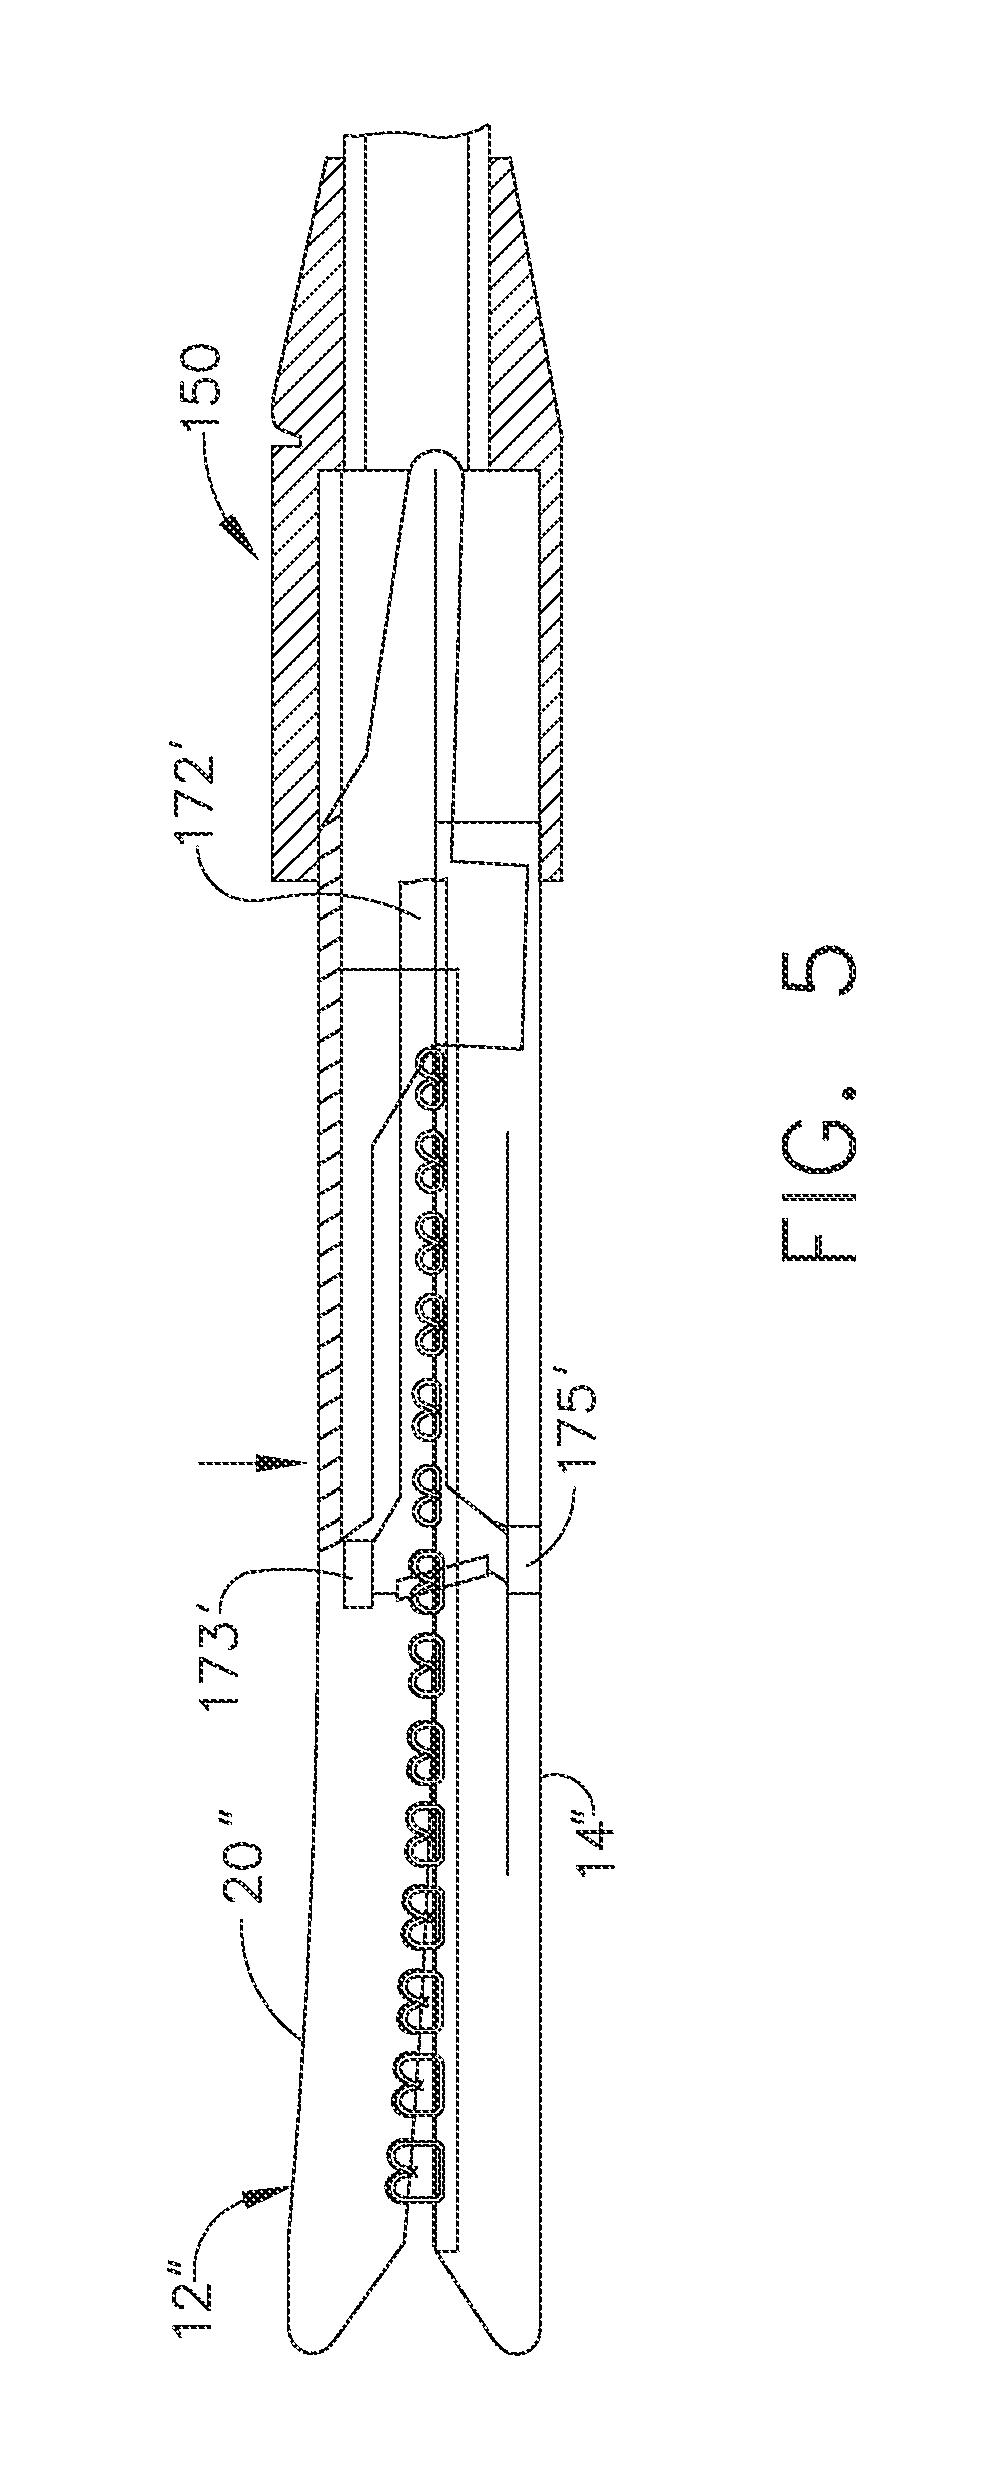 Ceiling Fan Motor Wiring Diagram Bypass Remote Module